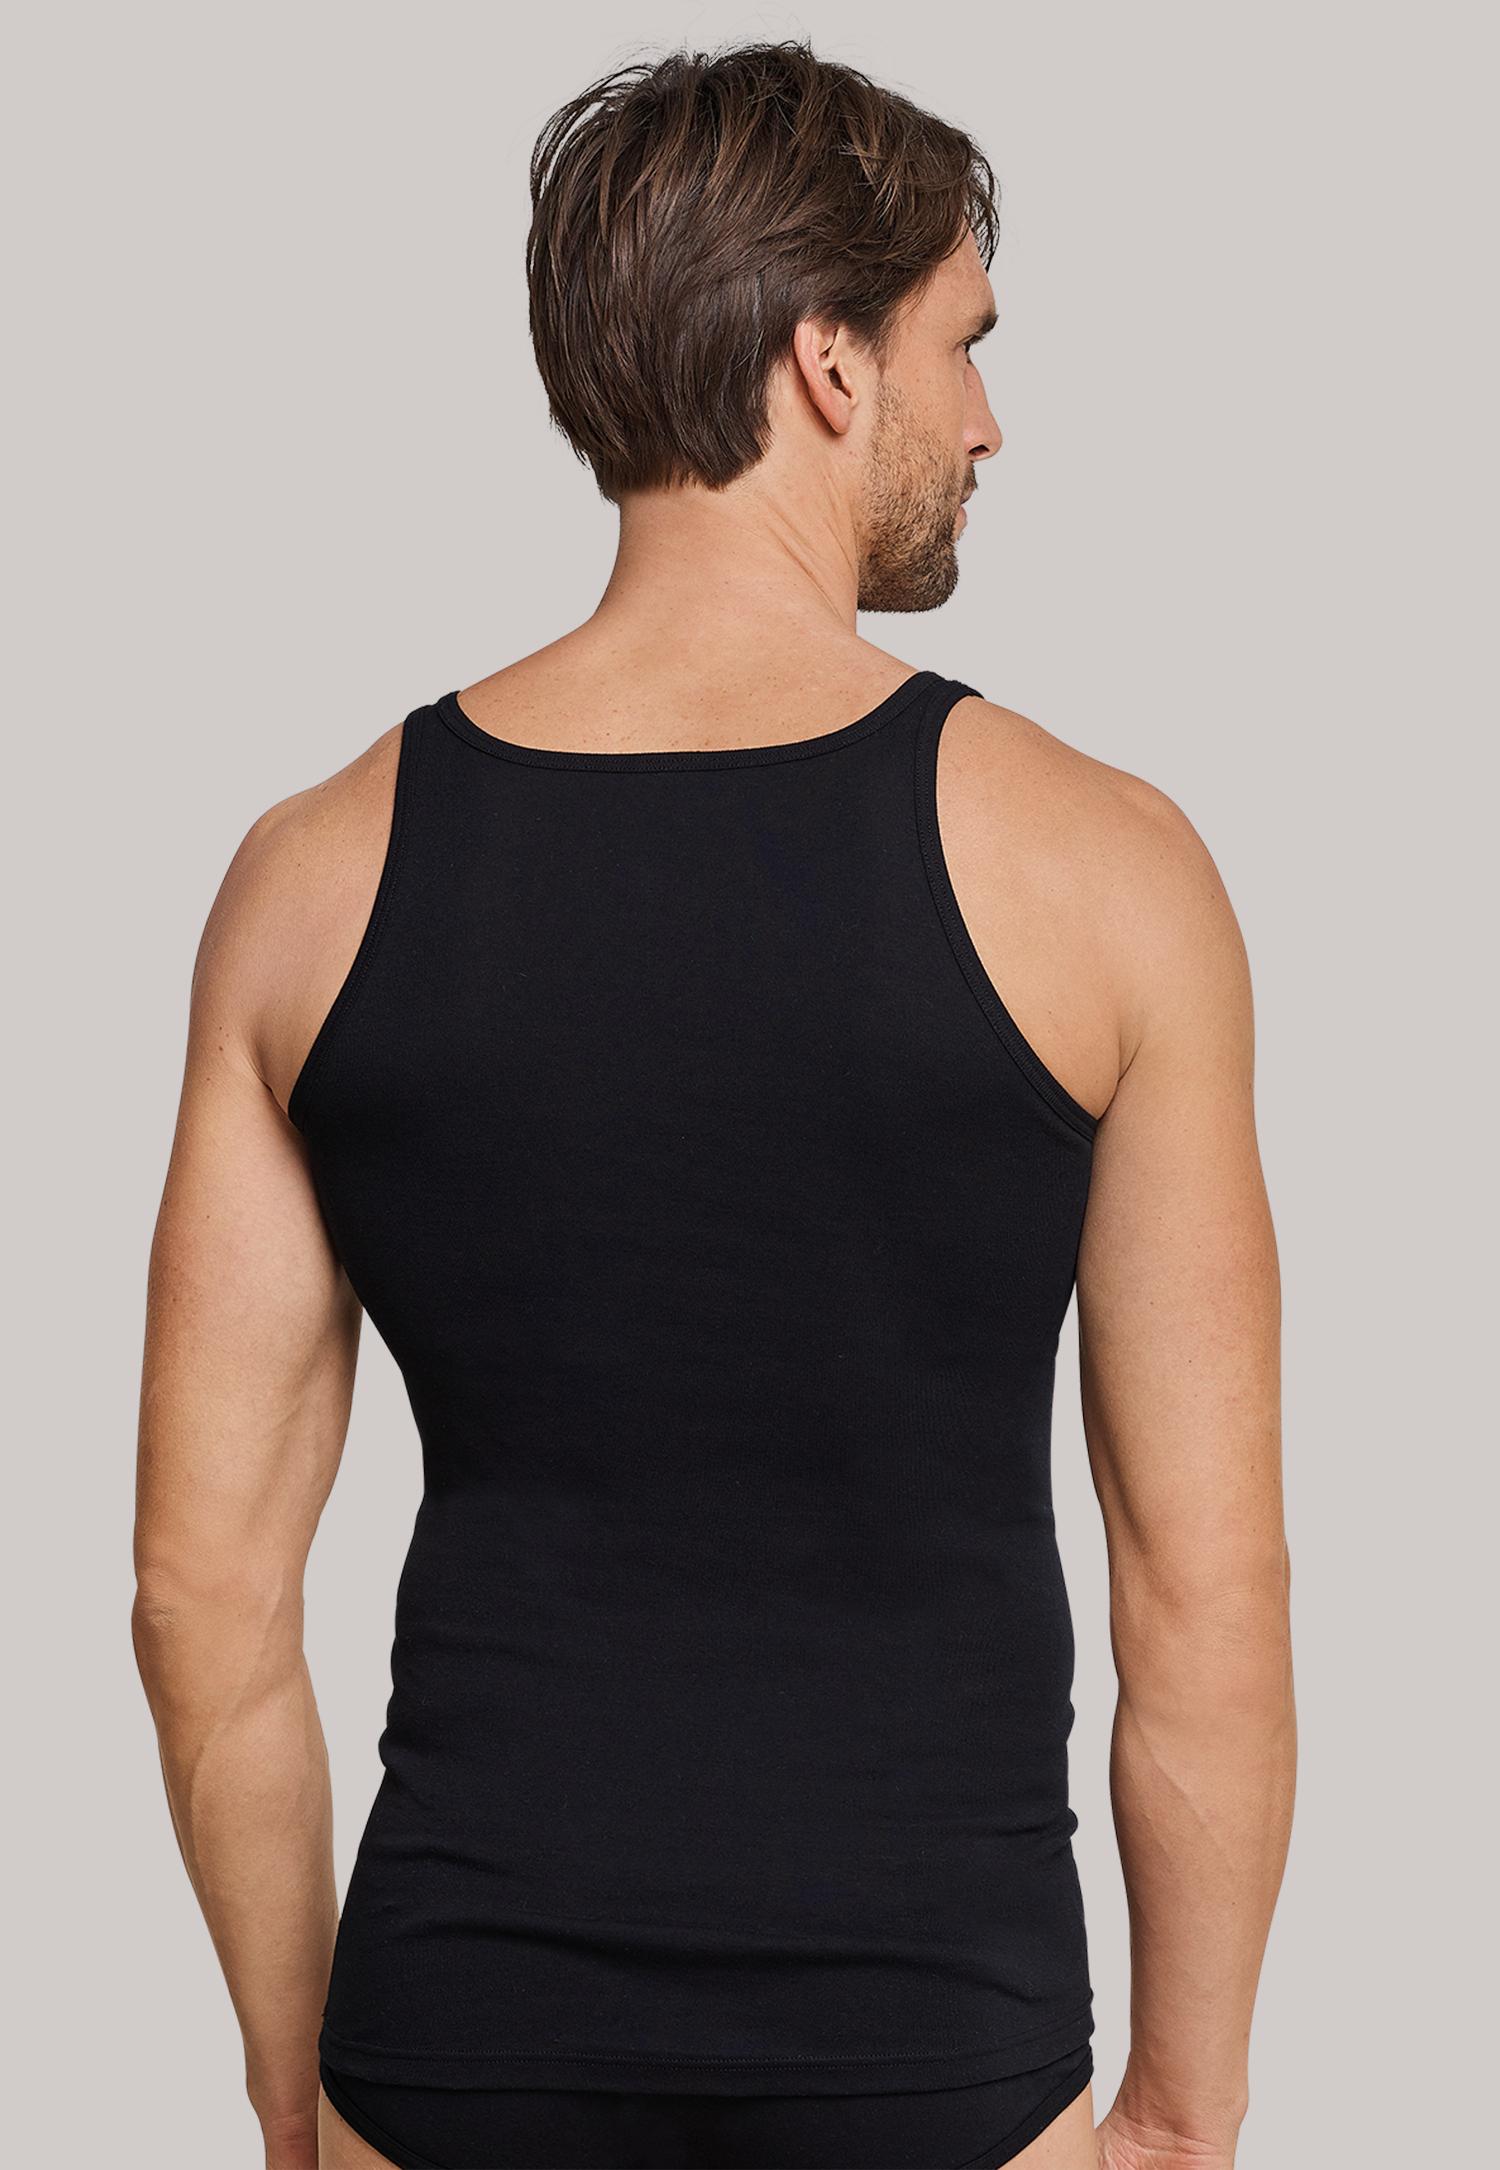 0d616ac0107 ... Singlet zwart Schiesser Original Feinripp, heren ondergoed, Singlet  zwart